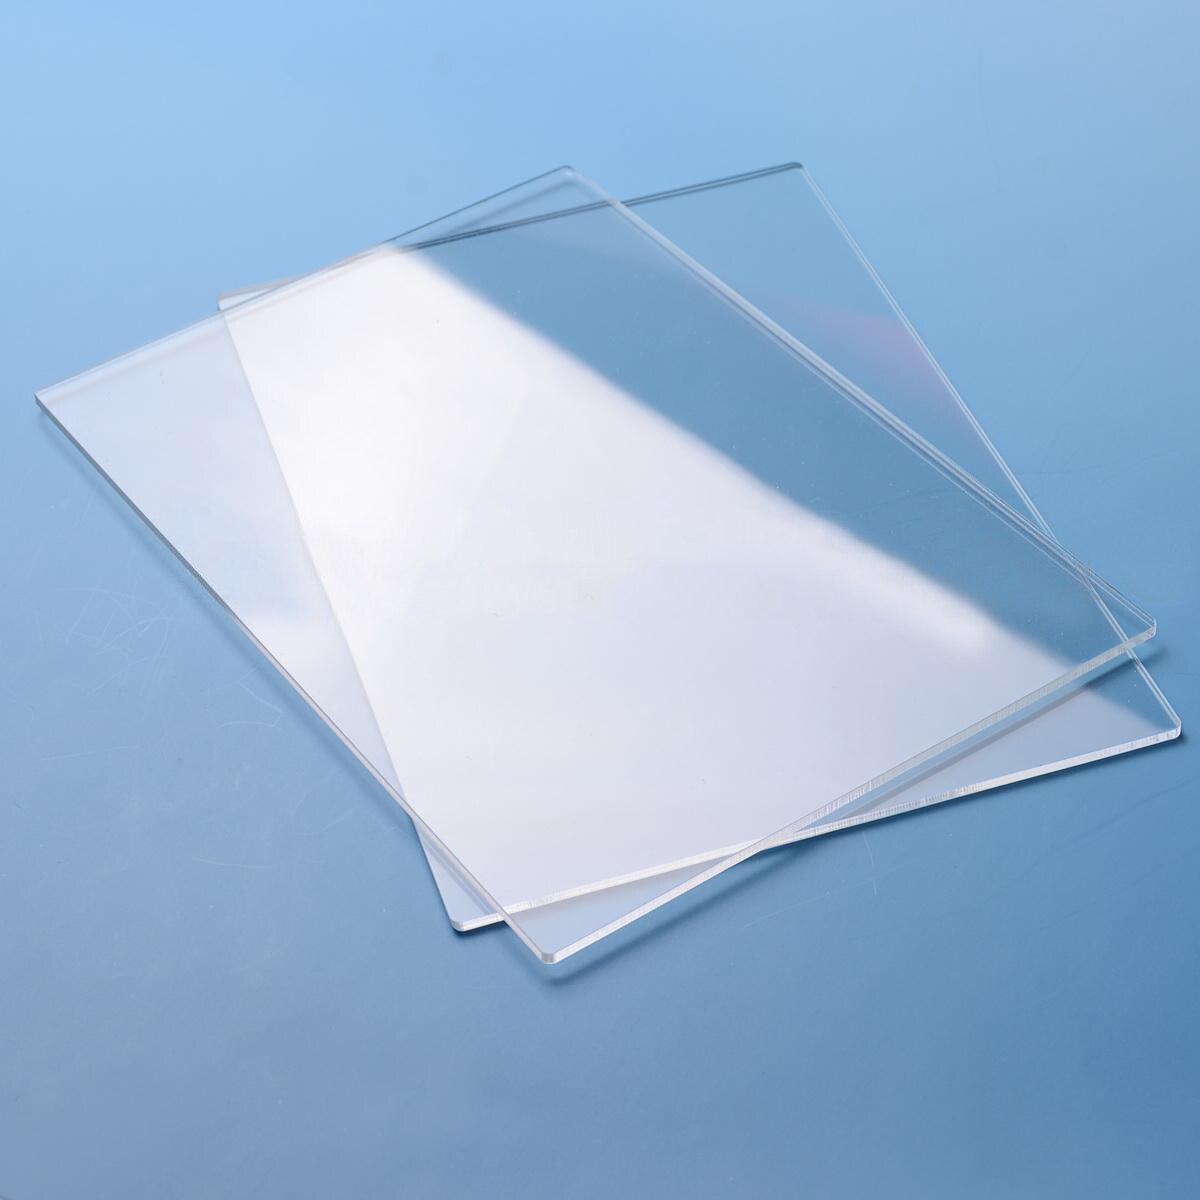 2pcs 155mm*225mm*3mm Generic Acrylic Transparent Cutting Plates For Big Shot New2pcs 155mm*225mm*3mm Generic Acrylic Transparent Cutting Plates For Big Shot New